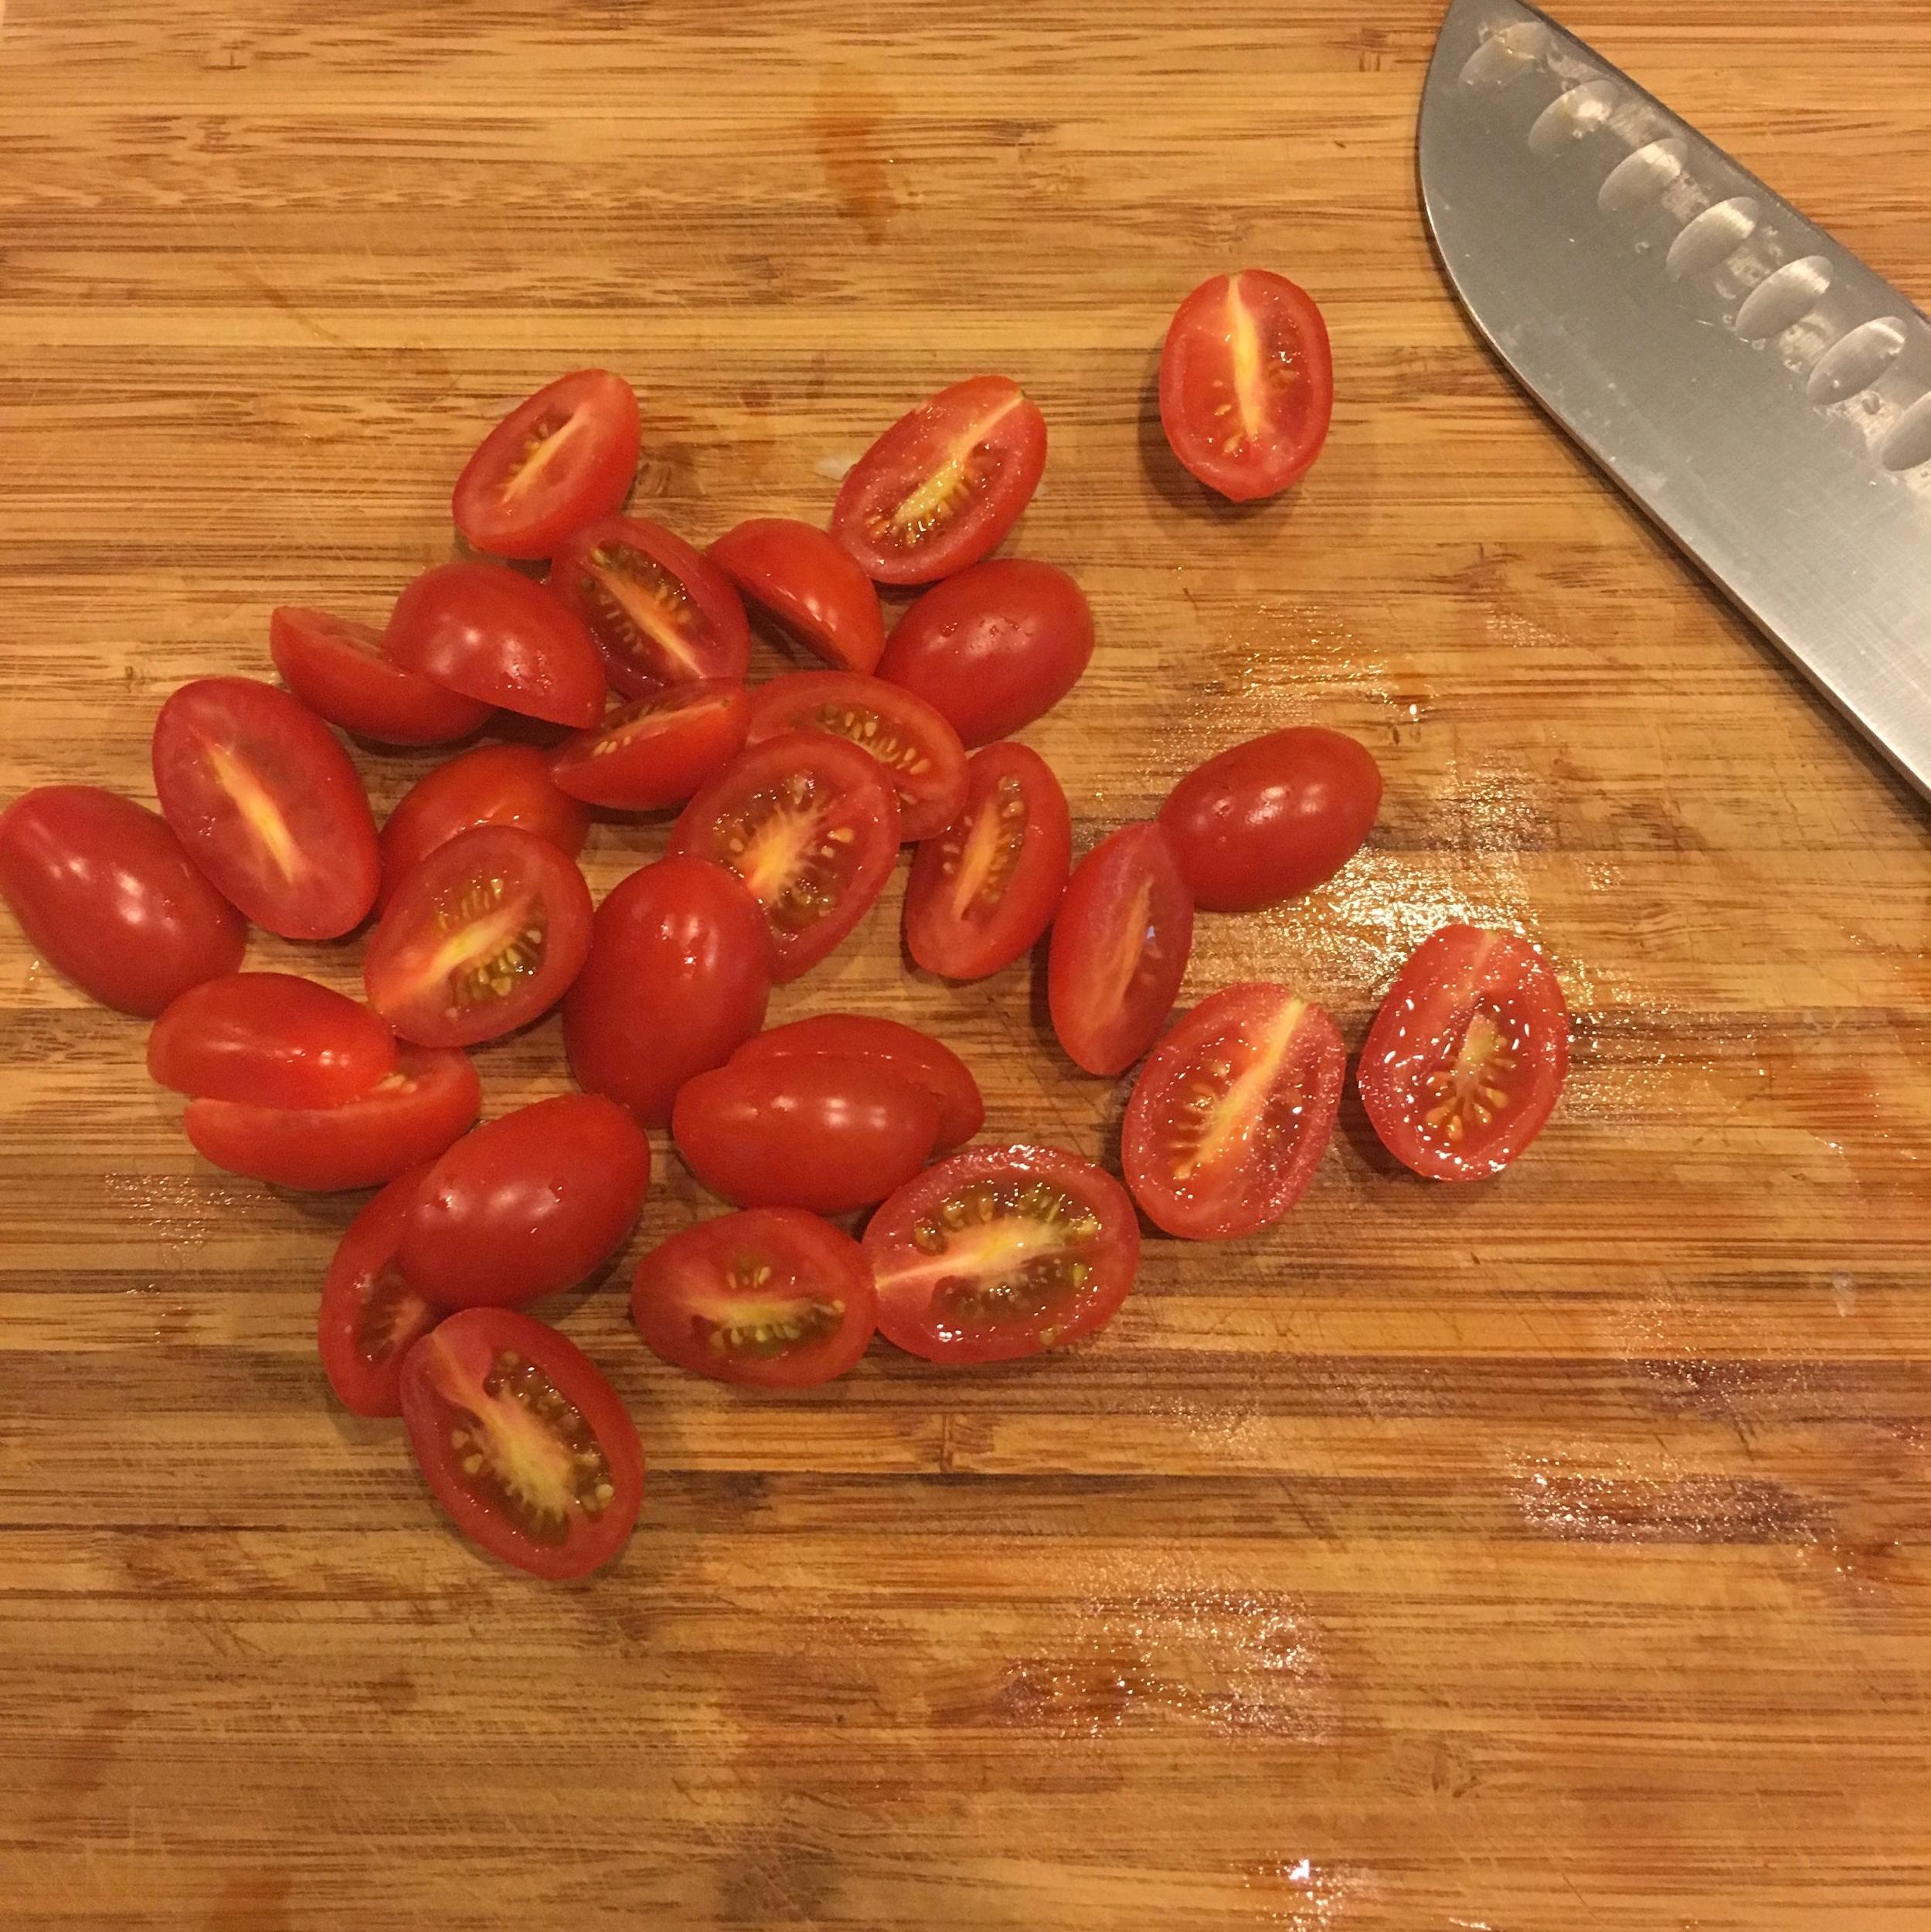 Tomato prep